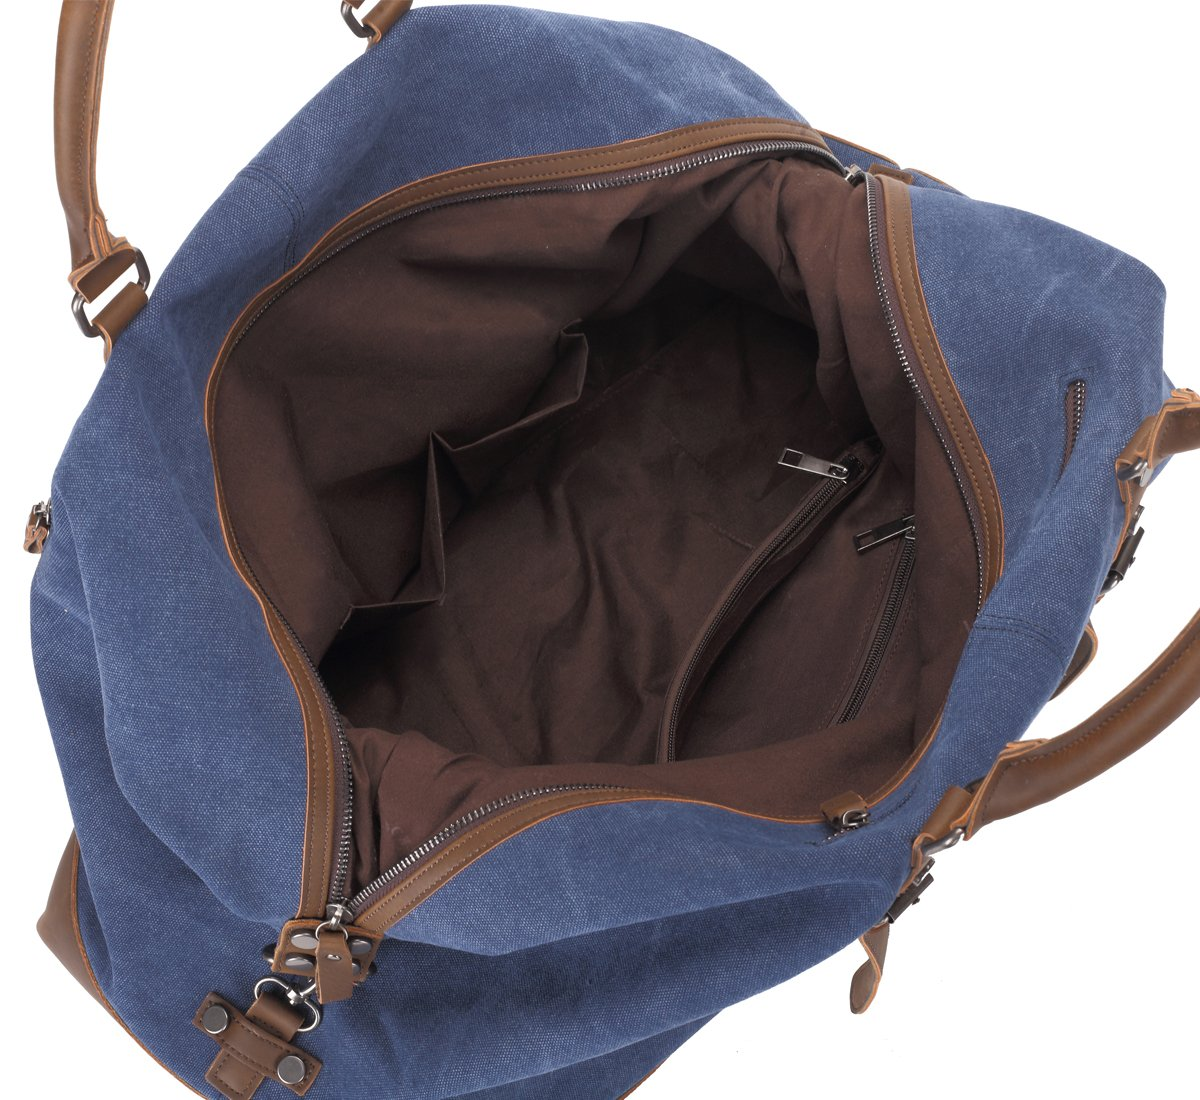 Weekend Bag Weekender Overnight Bag Canvas Vintage Travel Duffle for Men Women by UPANDFAST (Image #4)